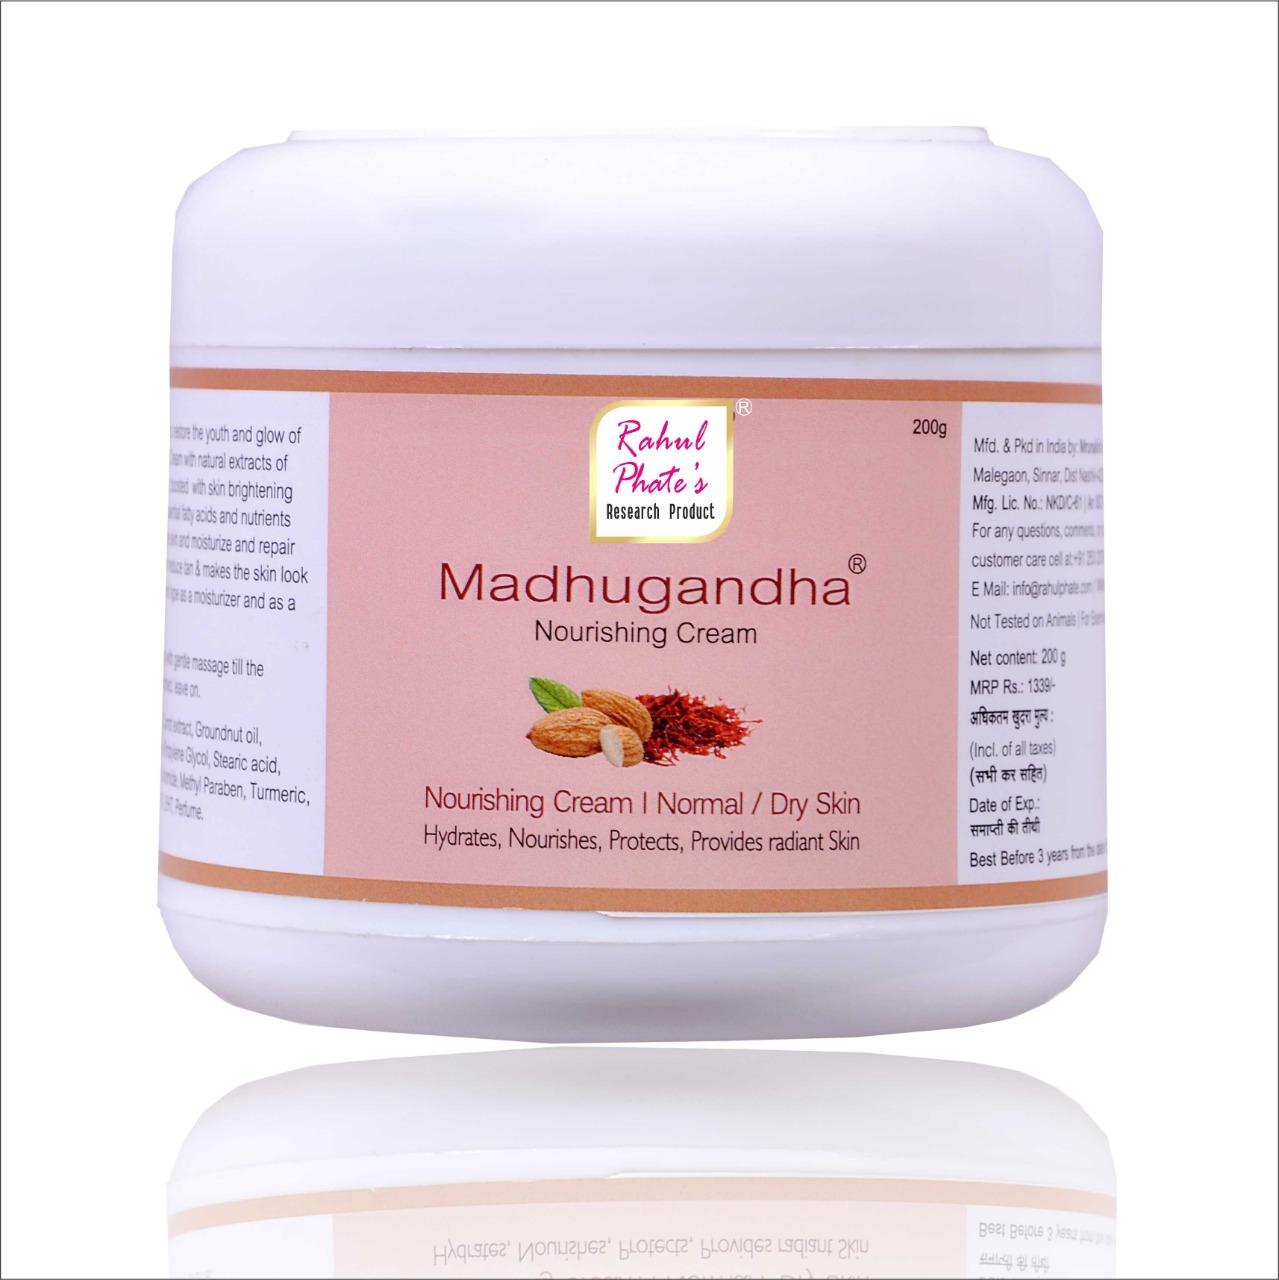 Rahul Phate Madhugandha Nourishing Cream 200g